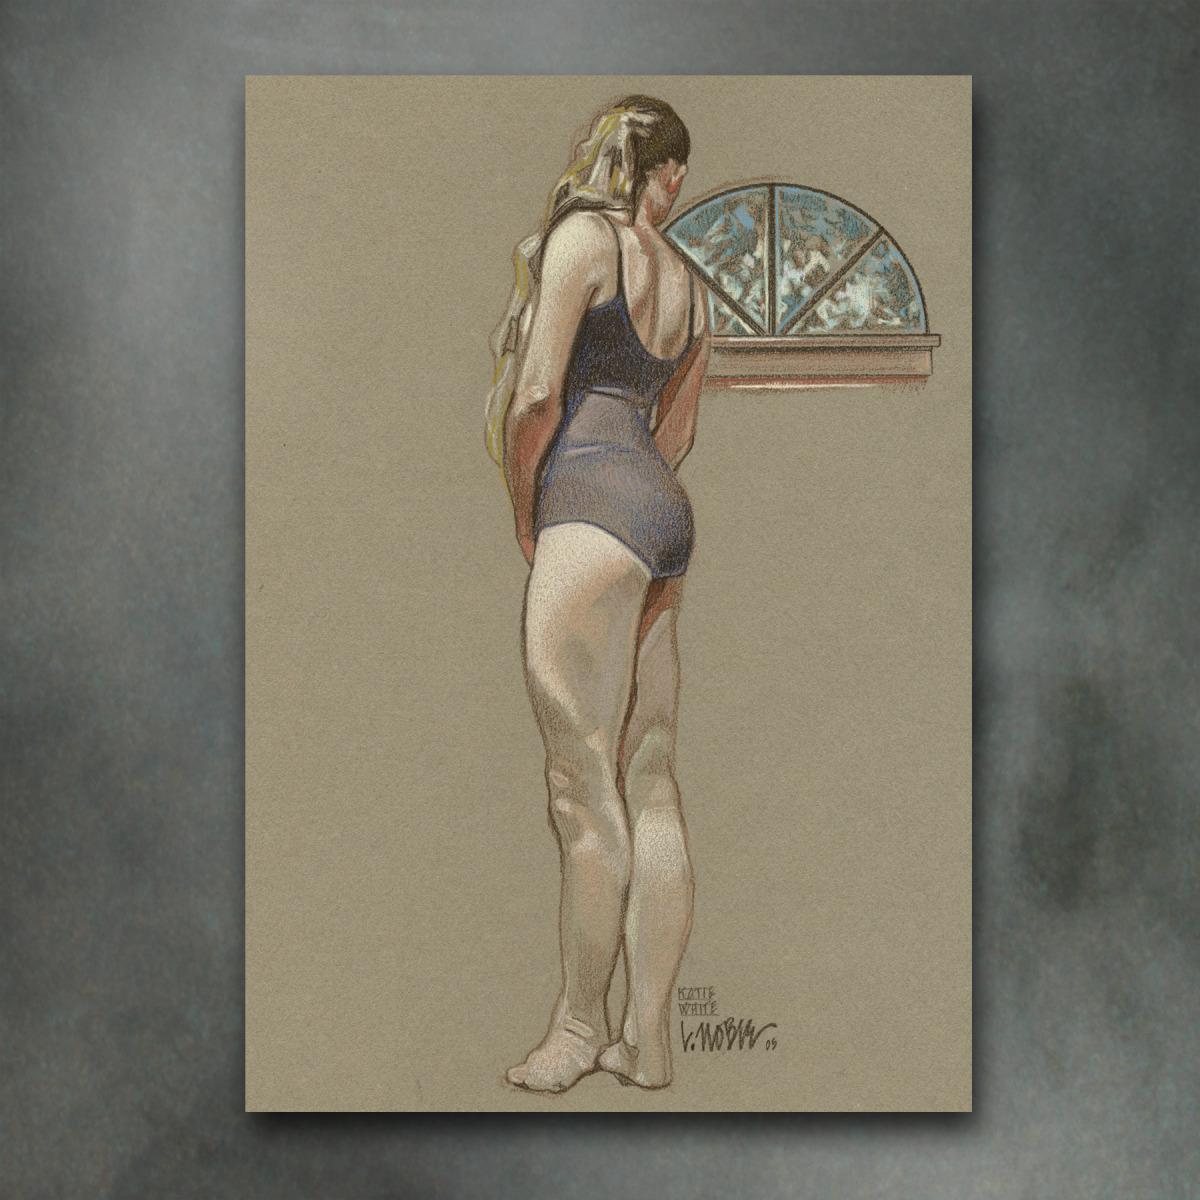 web-draw-balletkatie-1.jpg